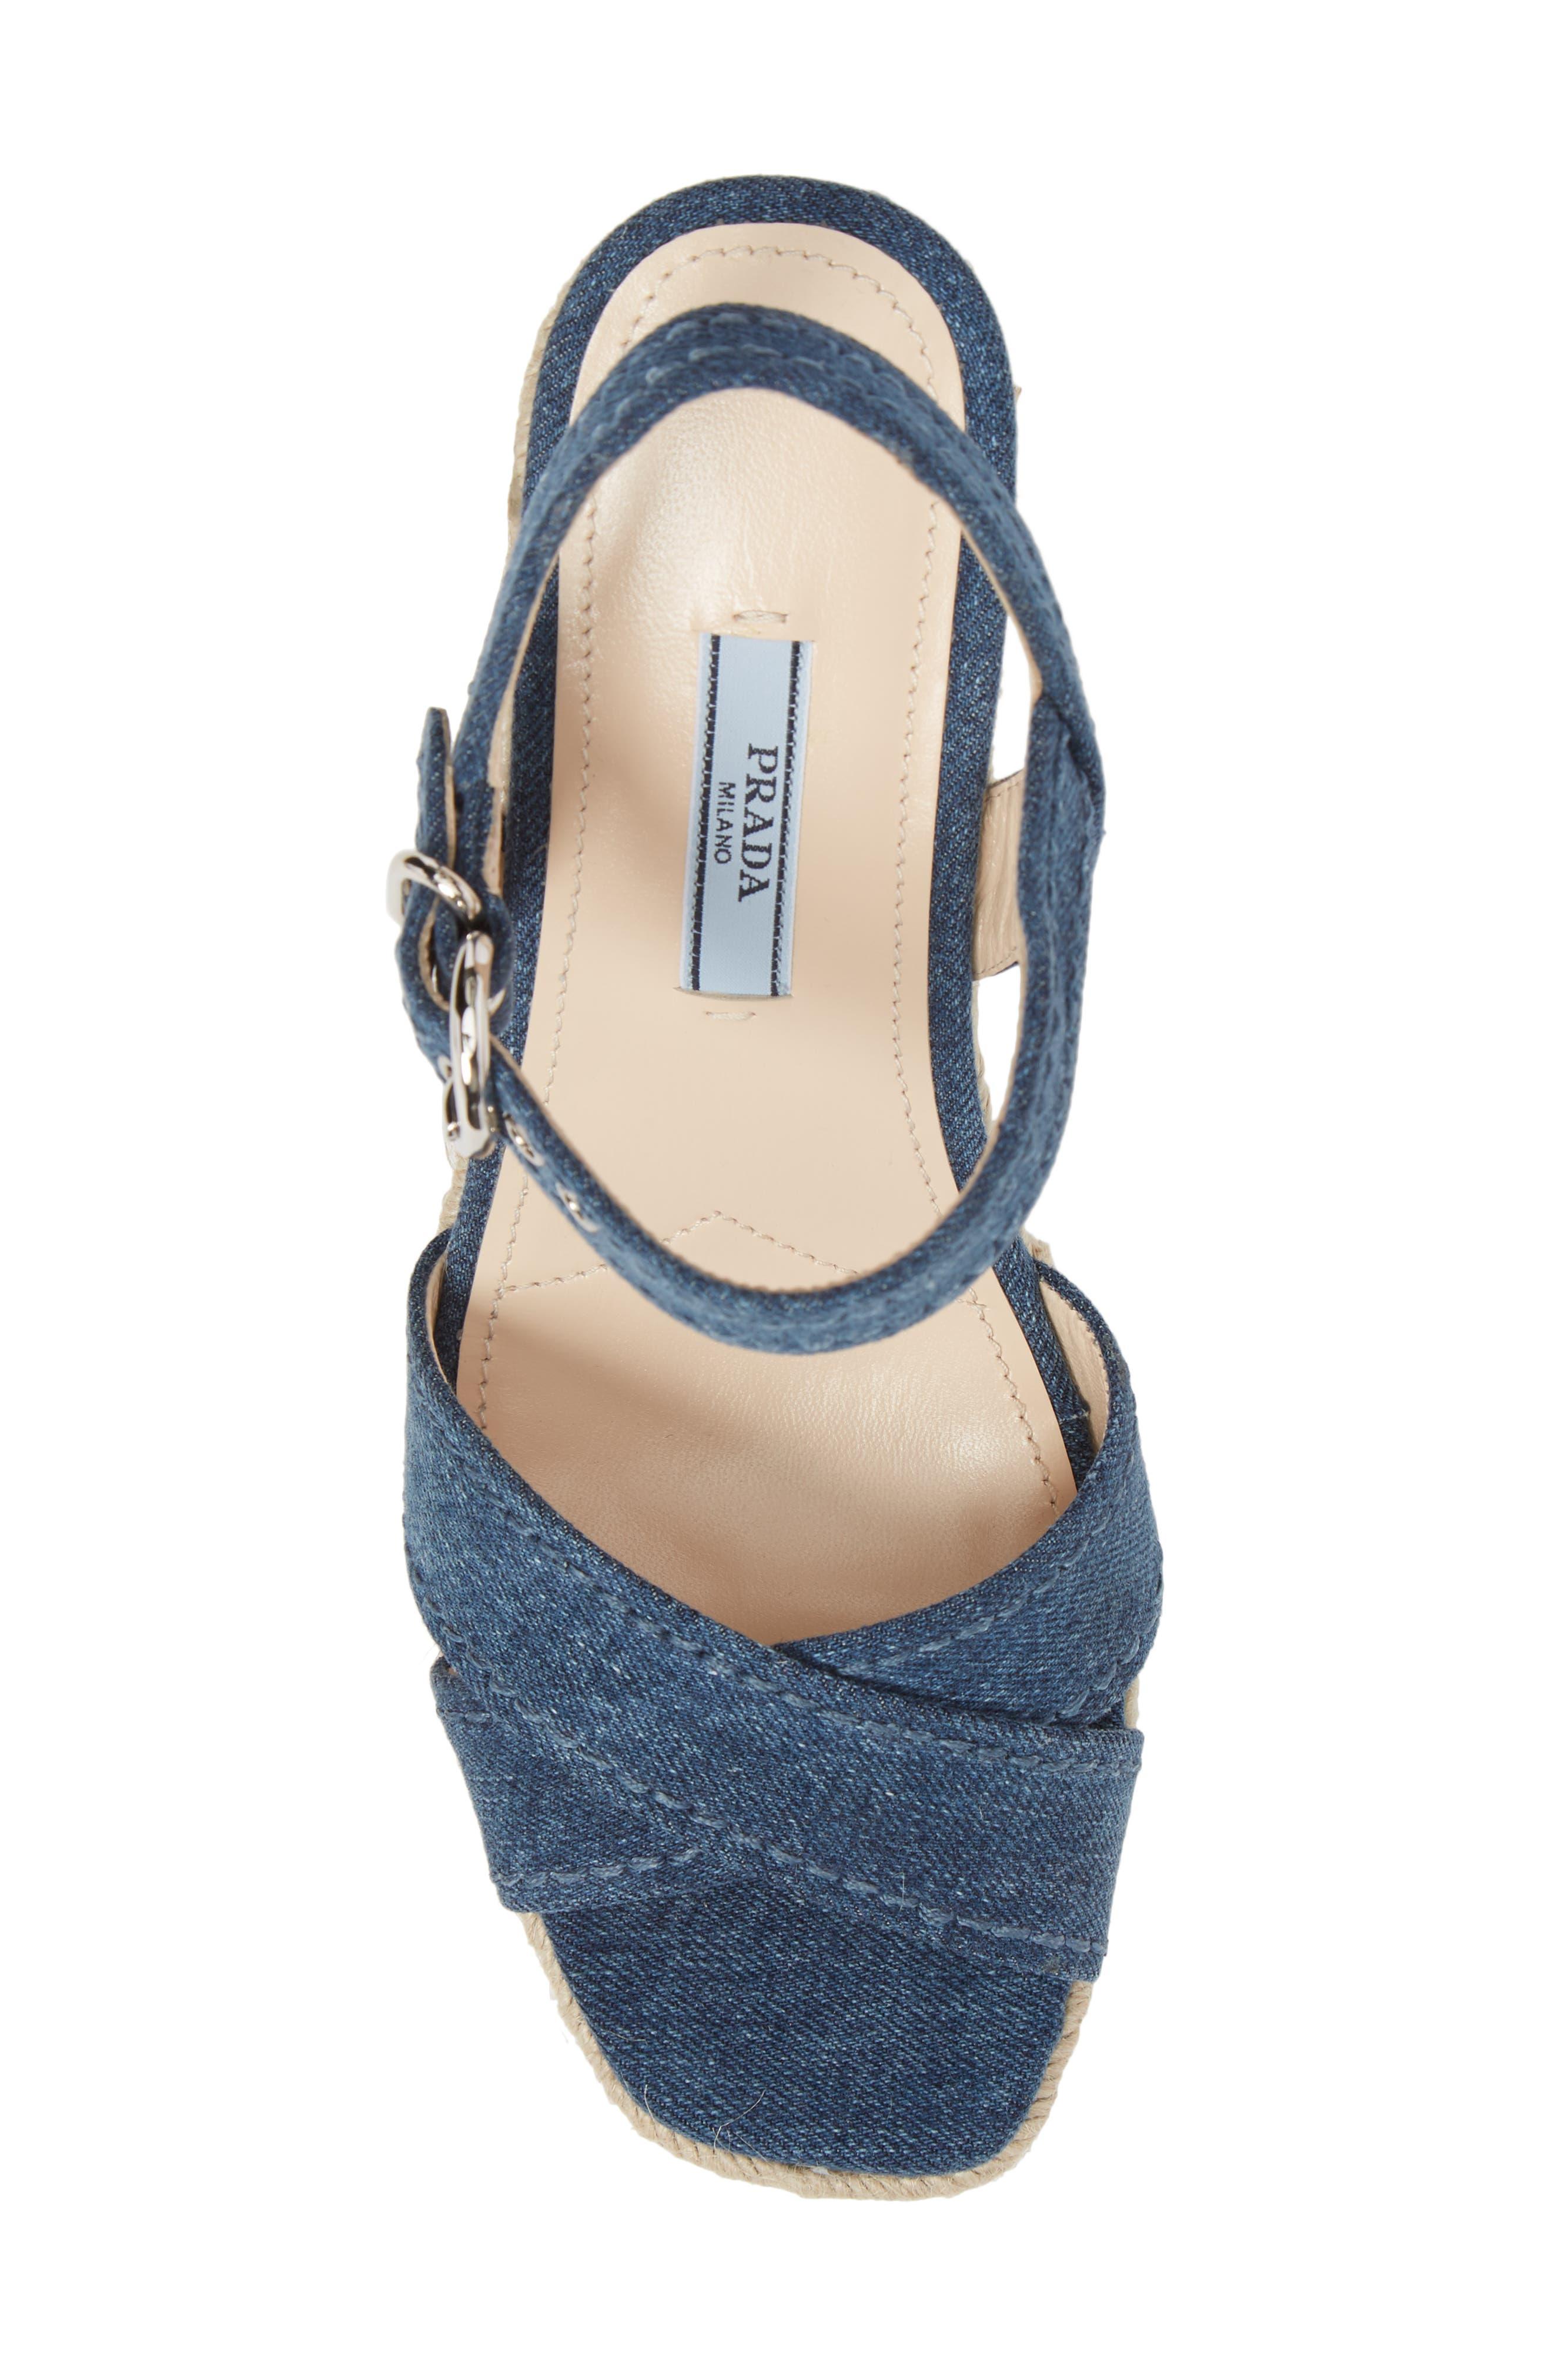 Espadrille Wedge Sandal,                             Alternate thumbnail 5, color,                             Blue